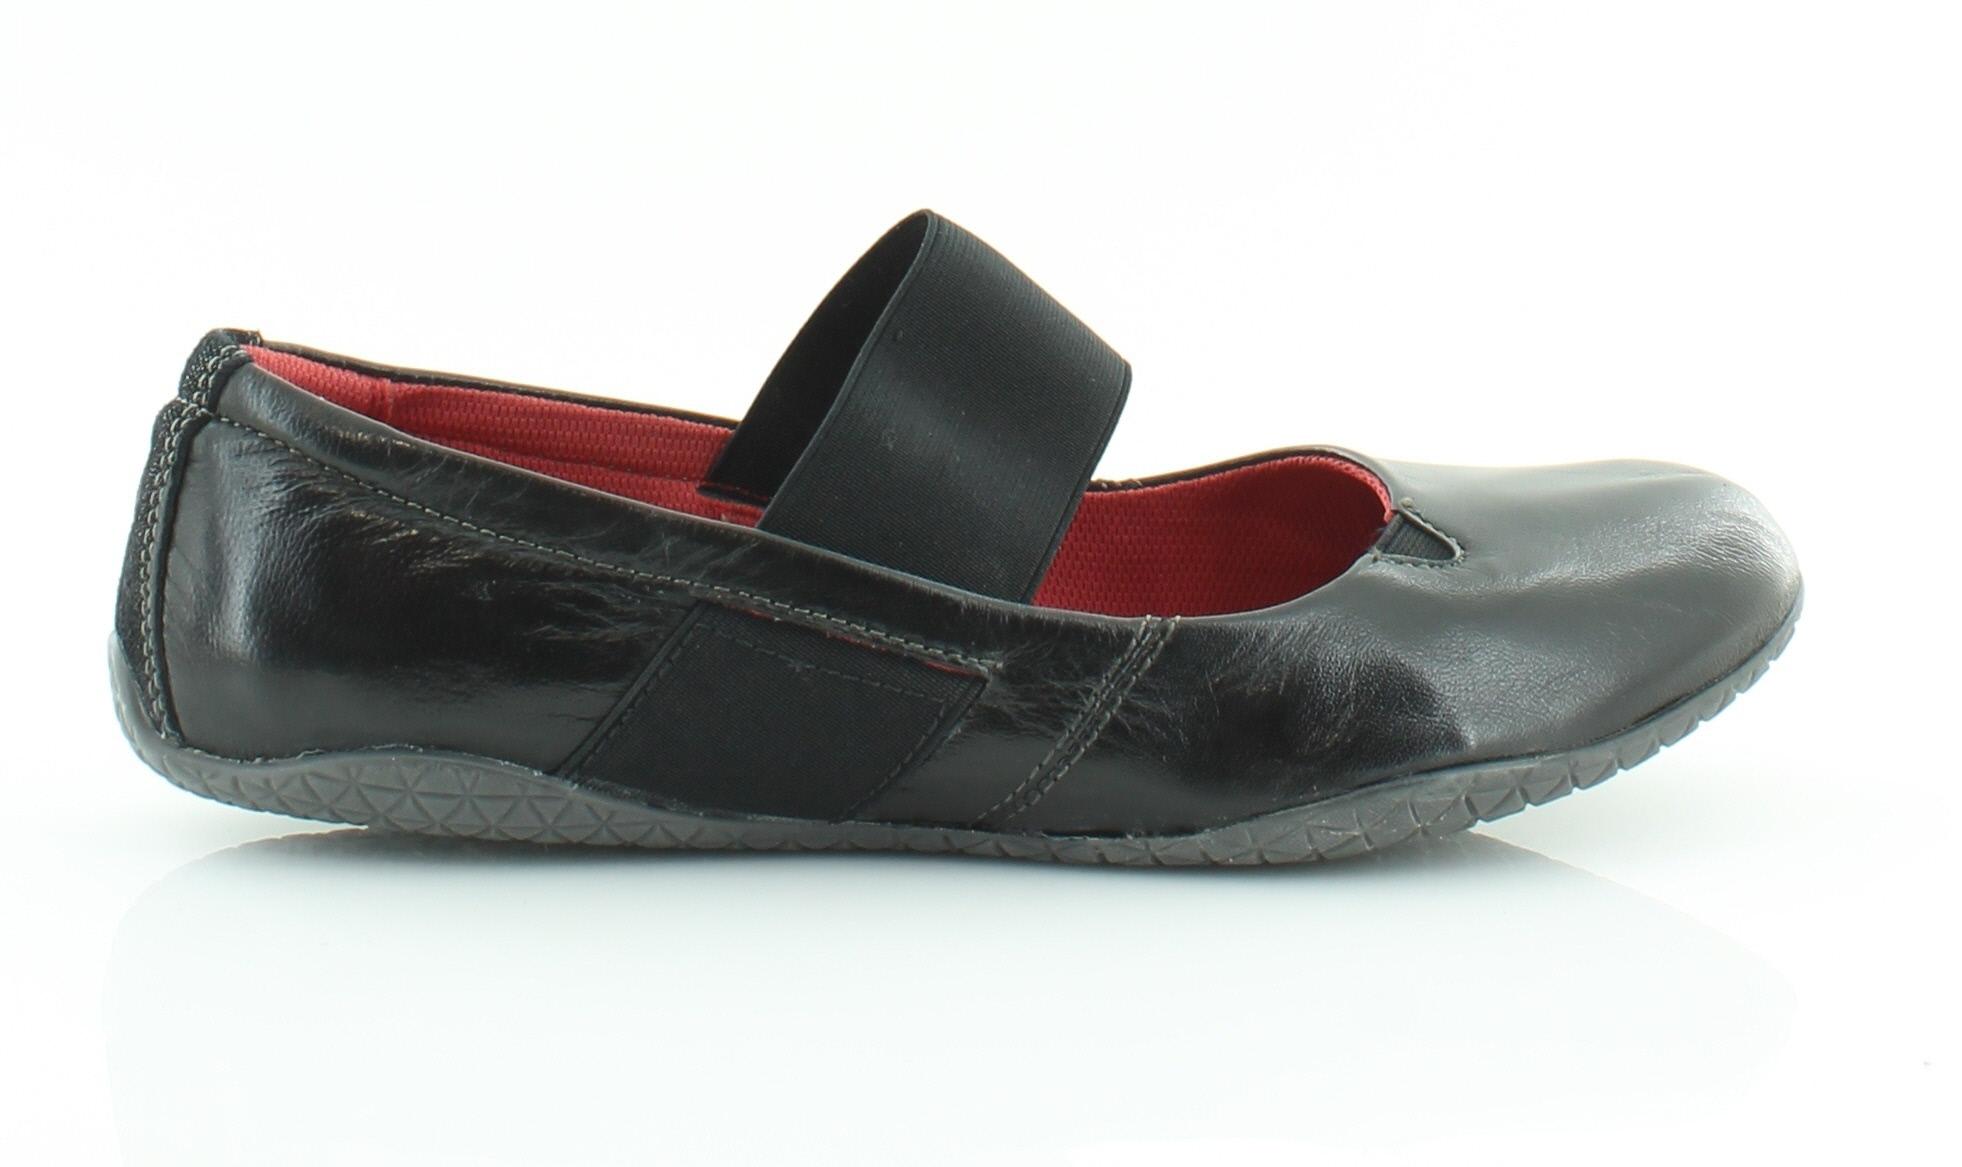 Hushpuppy Womens Shoes